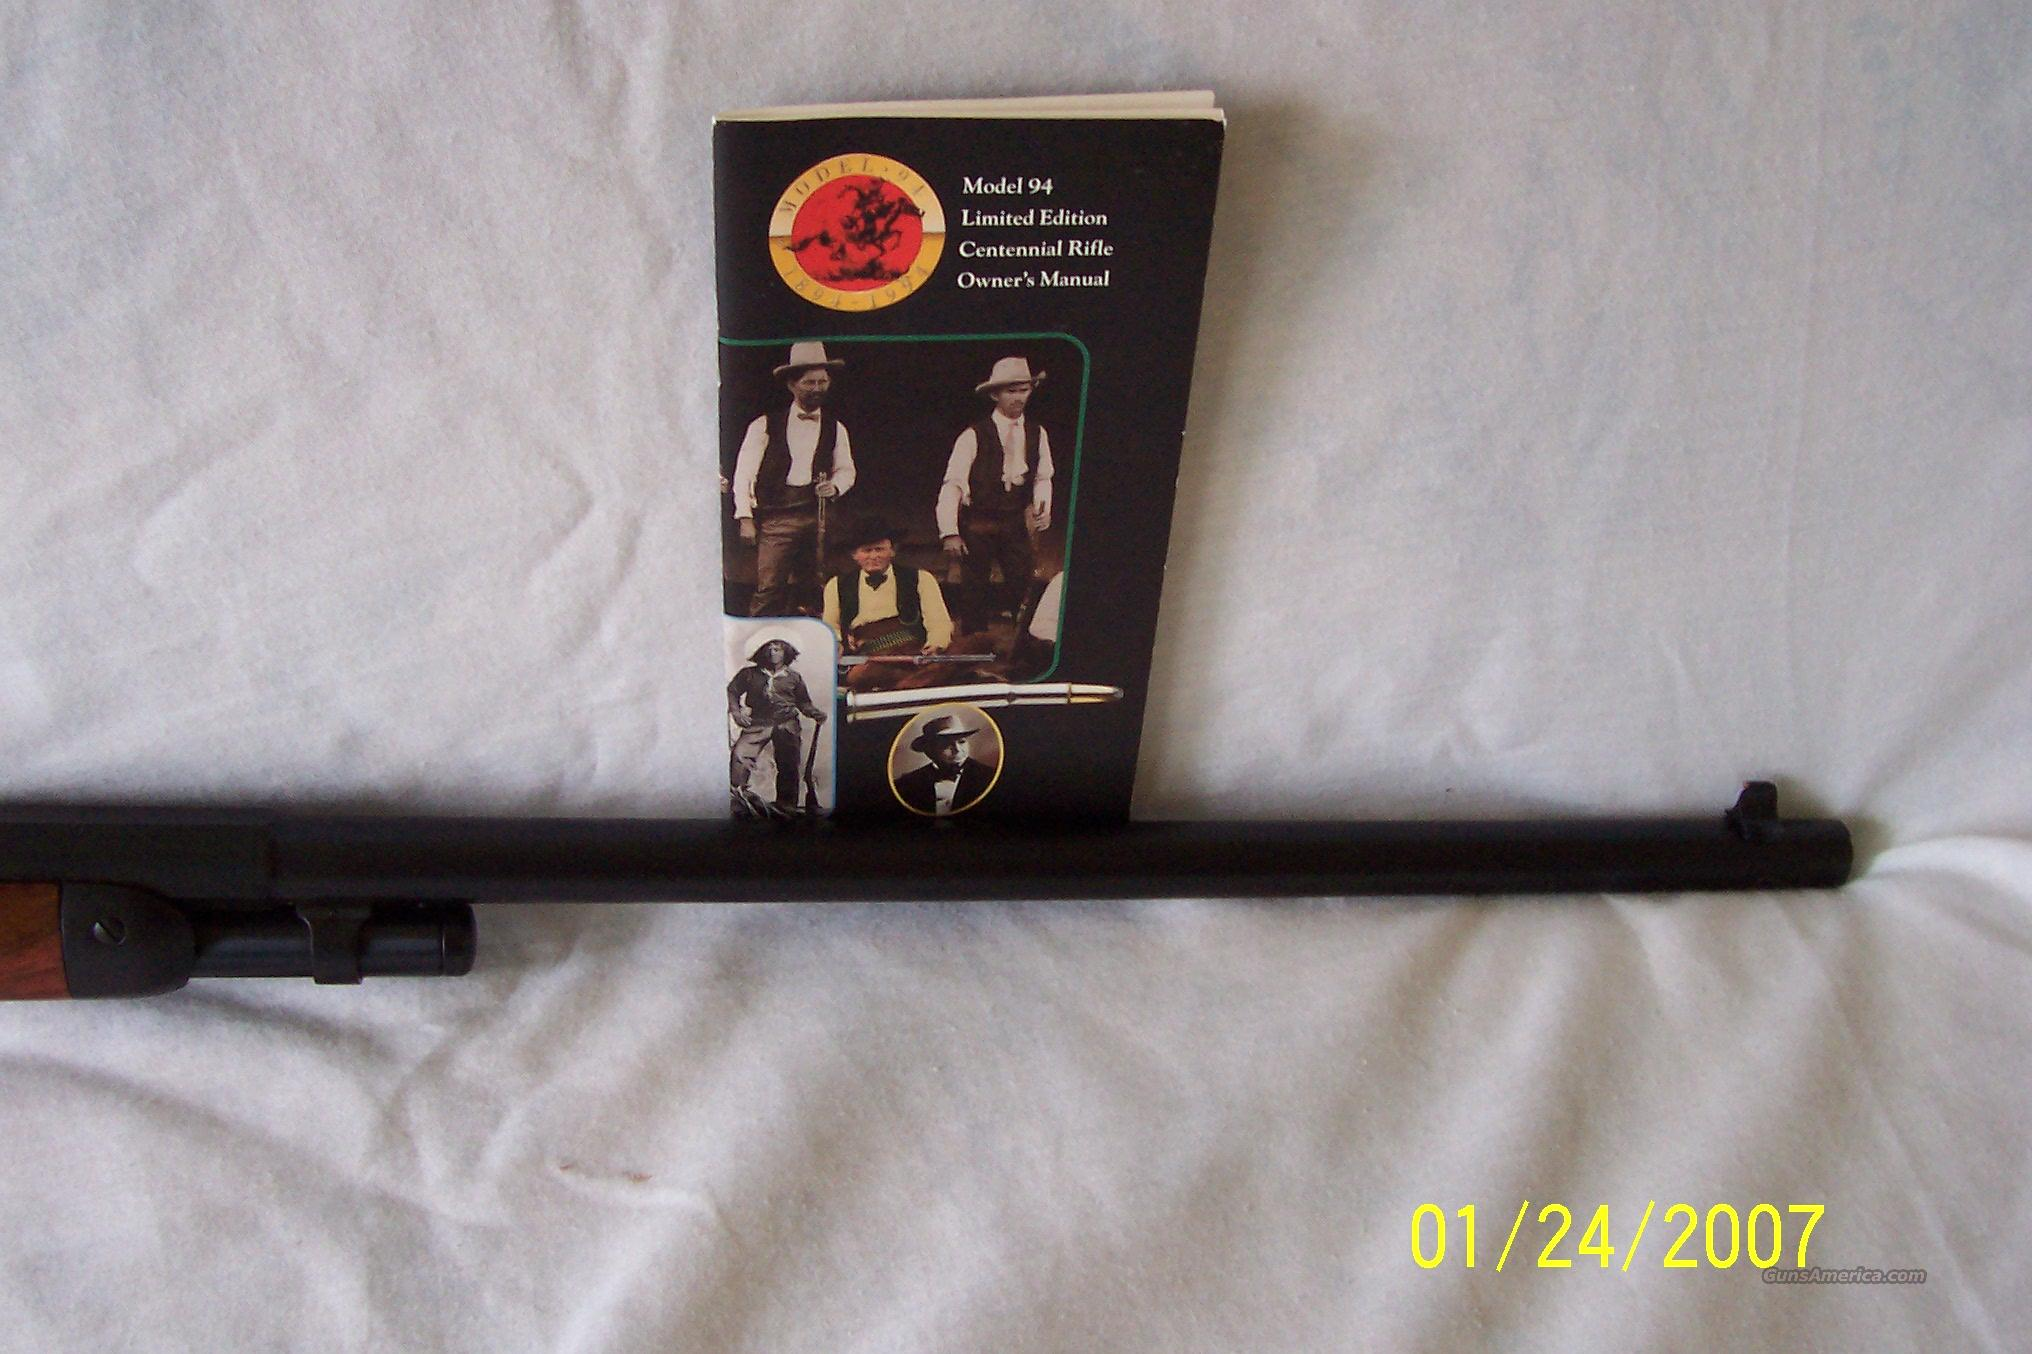 Winchester 1894/1994 Limited Edition Grade 1 30-30  Guns > Rifles > Winchester Rifles - Modern Lever > Model 94 > Post-64